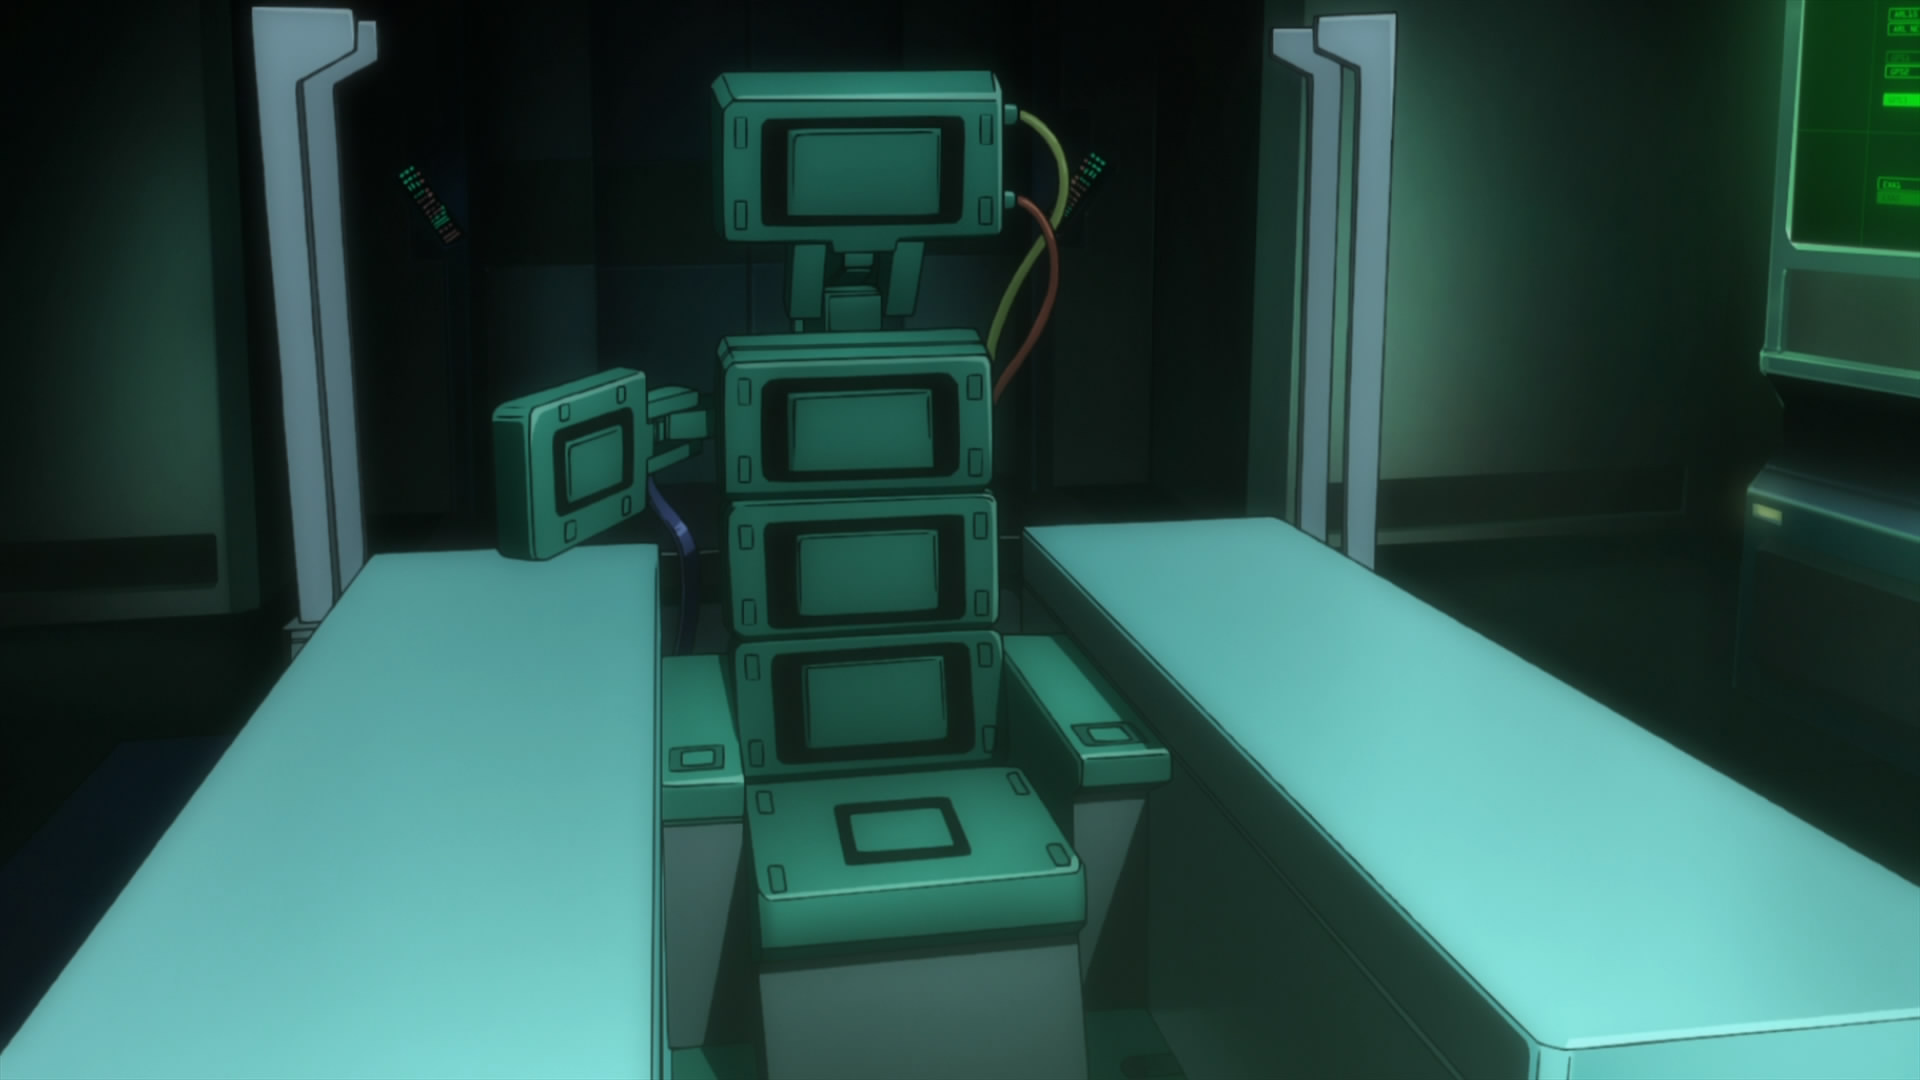 [gSS]_Mobile_Suit_Gundam_00_-_A_wakening_of_the_Trailblazer_(1080p)_[2B252856].mkv_snapshot_00.24.15_[2011.01.07_04.14.58]